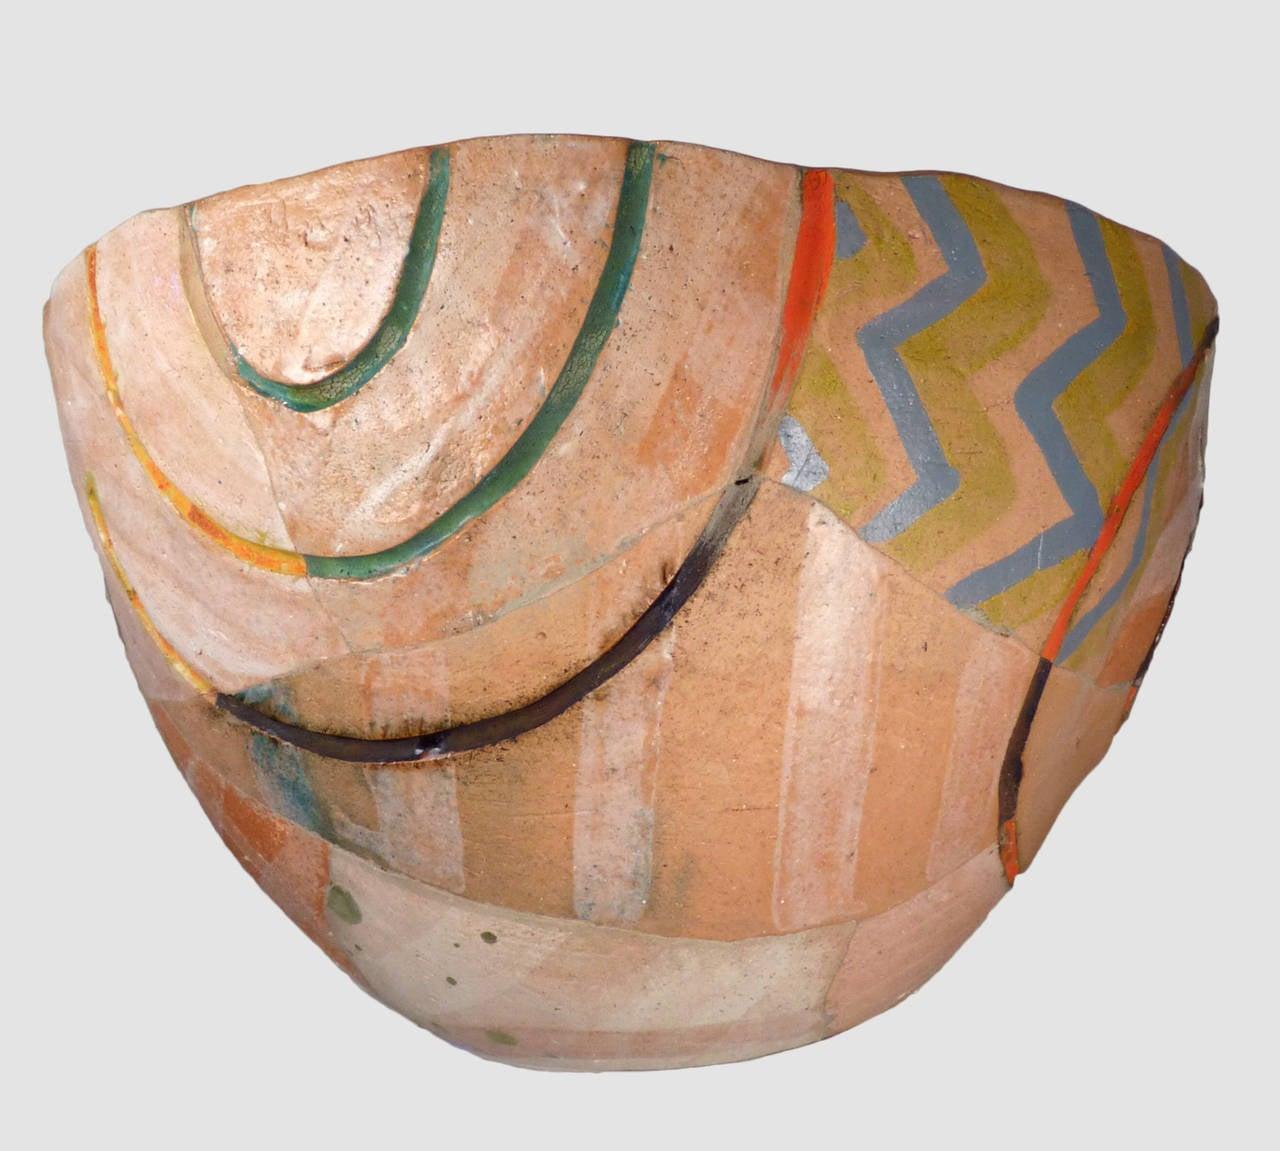 dating pottery sherds